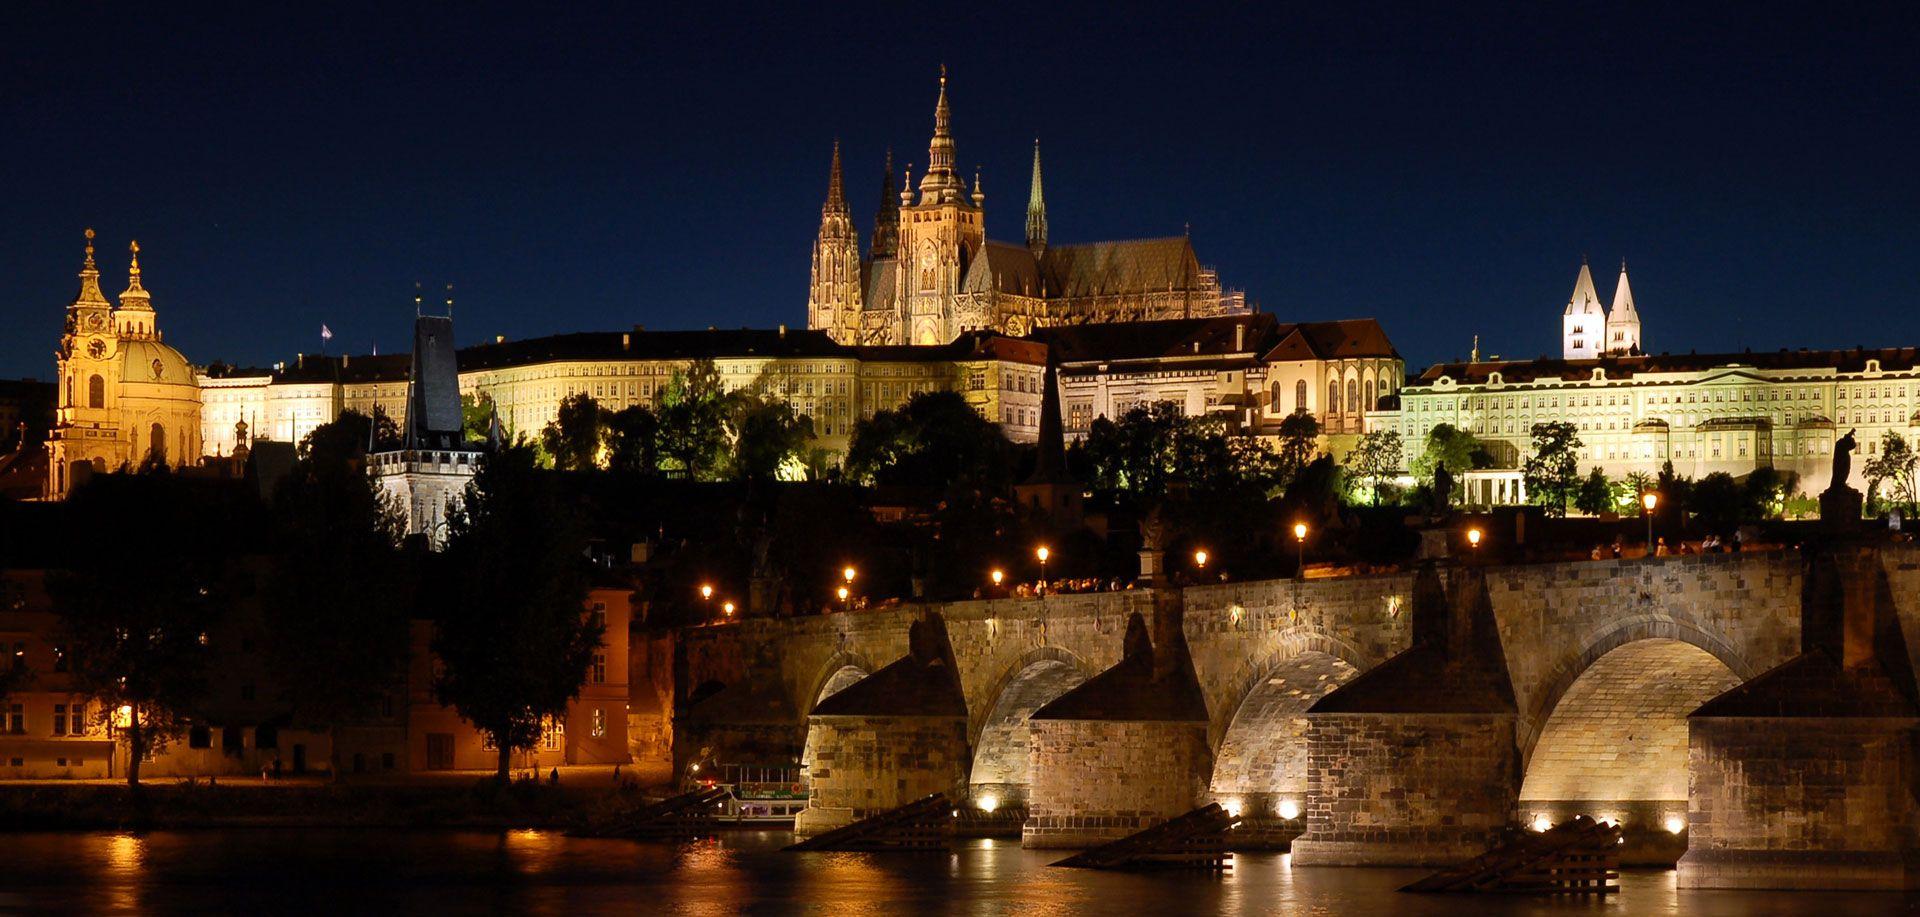 Prague photography tour, private tour